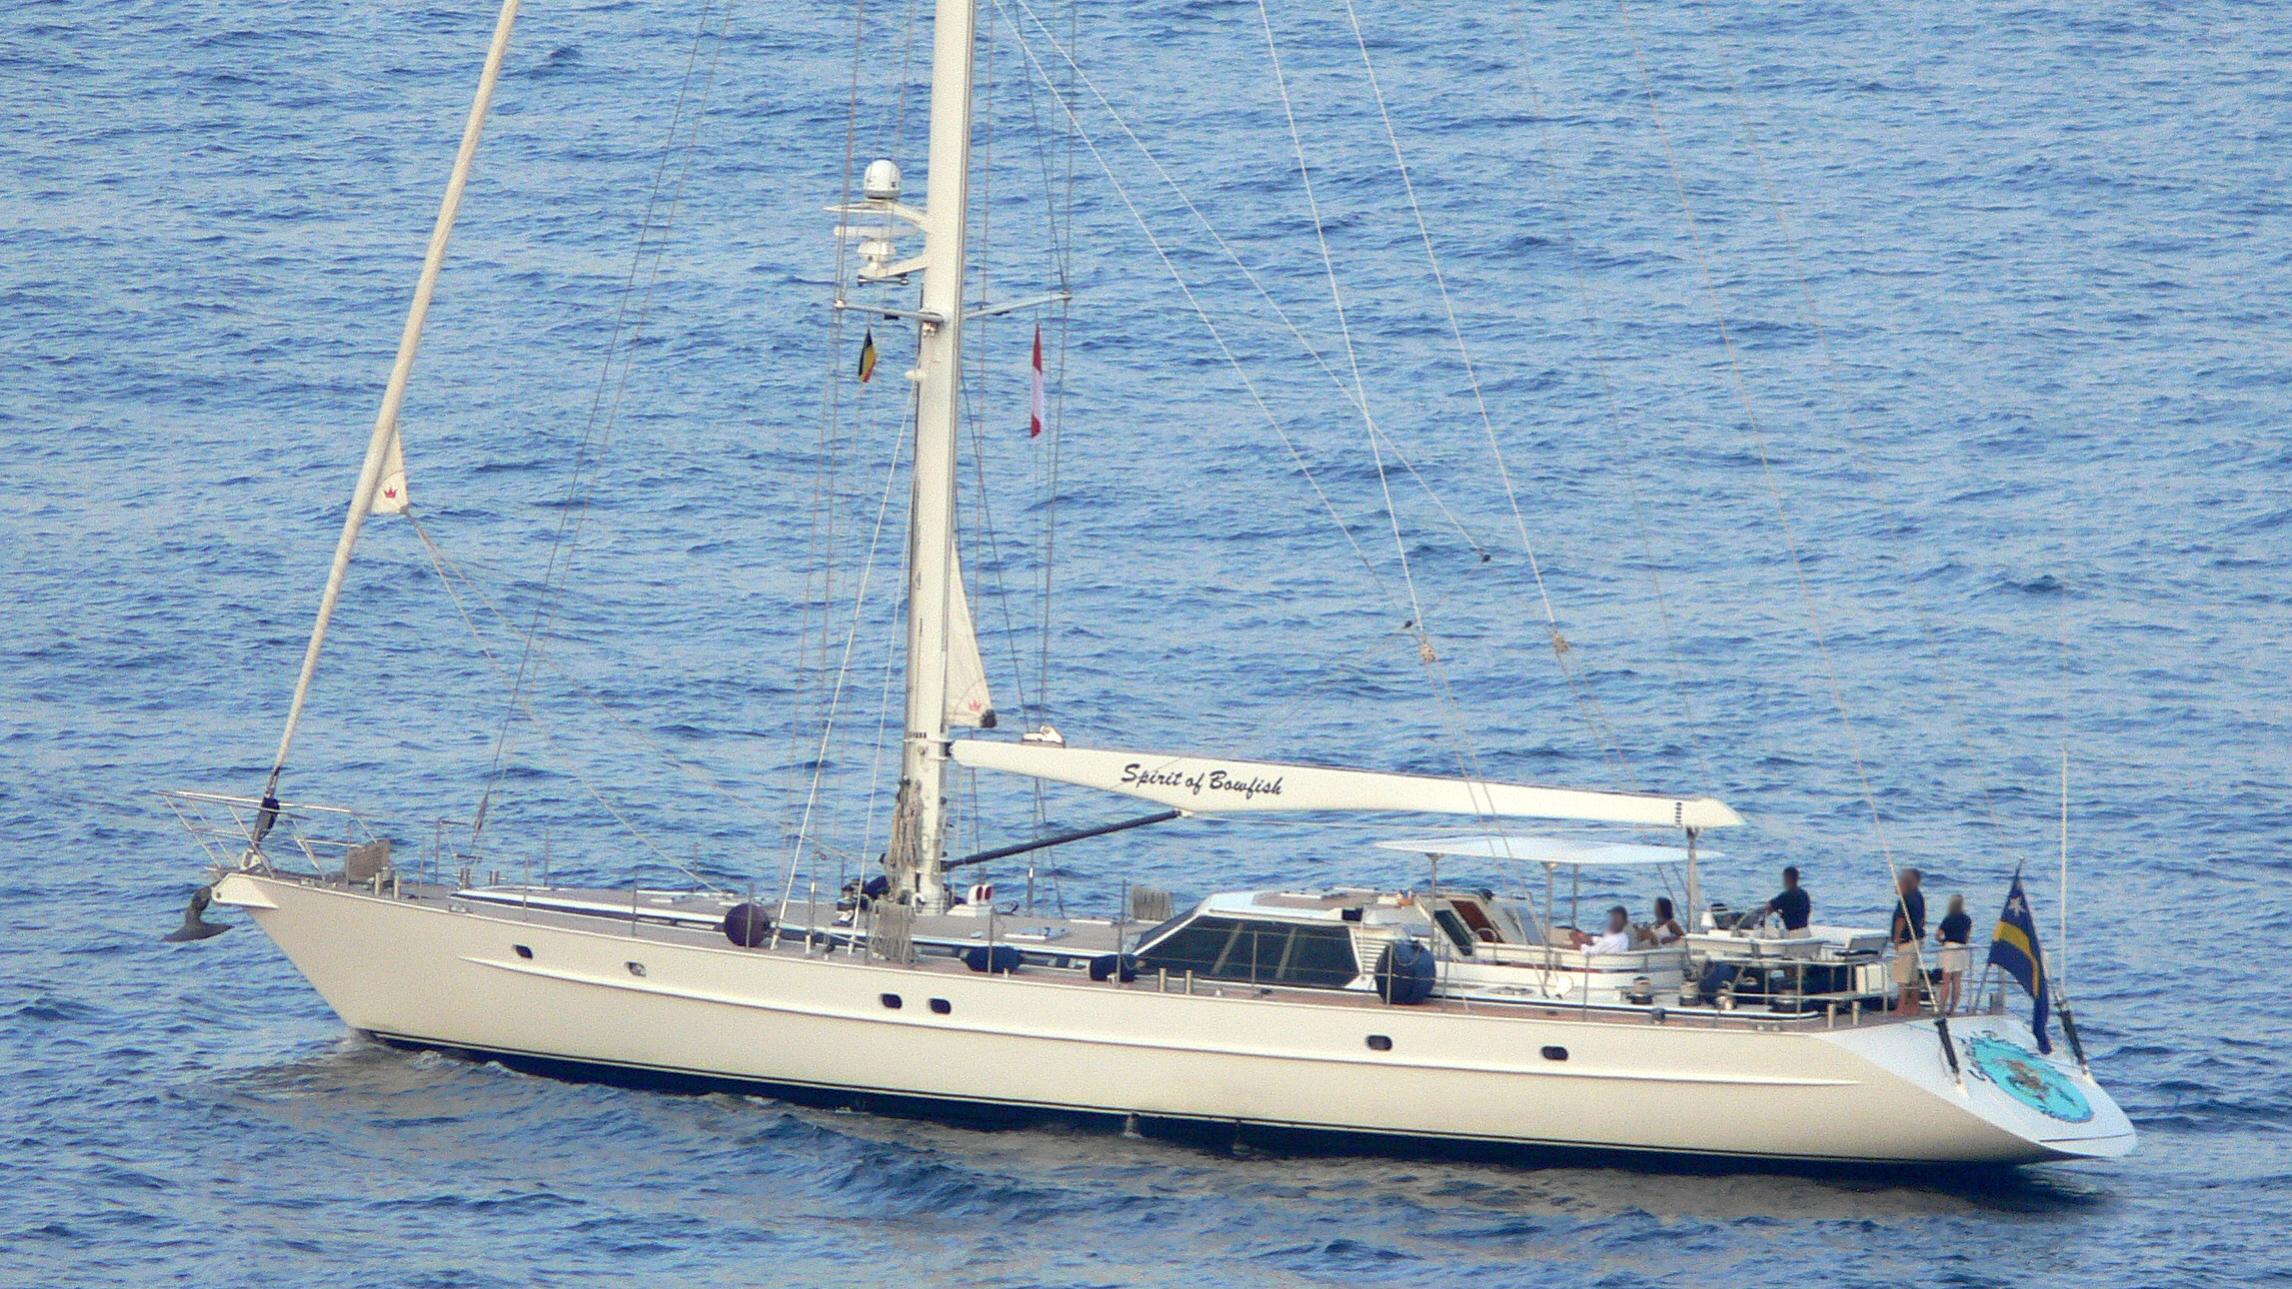 scorpius spirit of bowfish sailing yacht jongert 29m 1991 profile